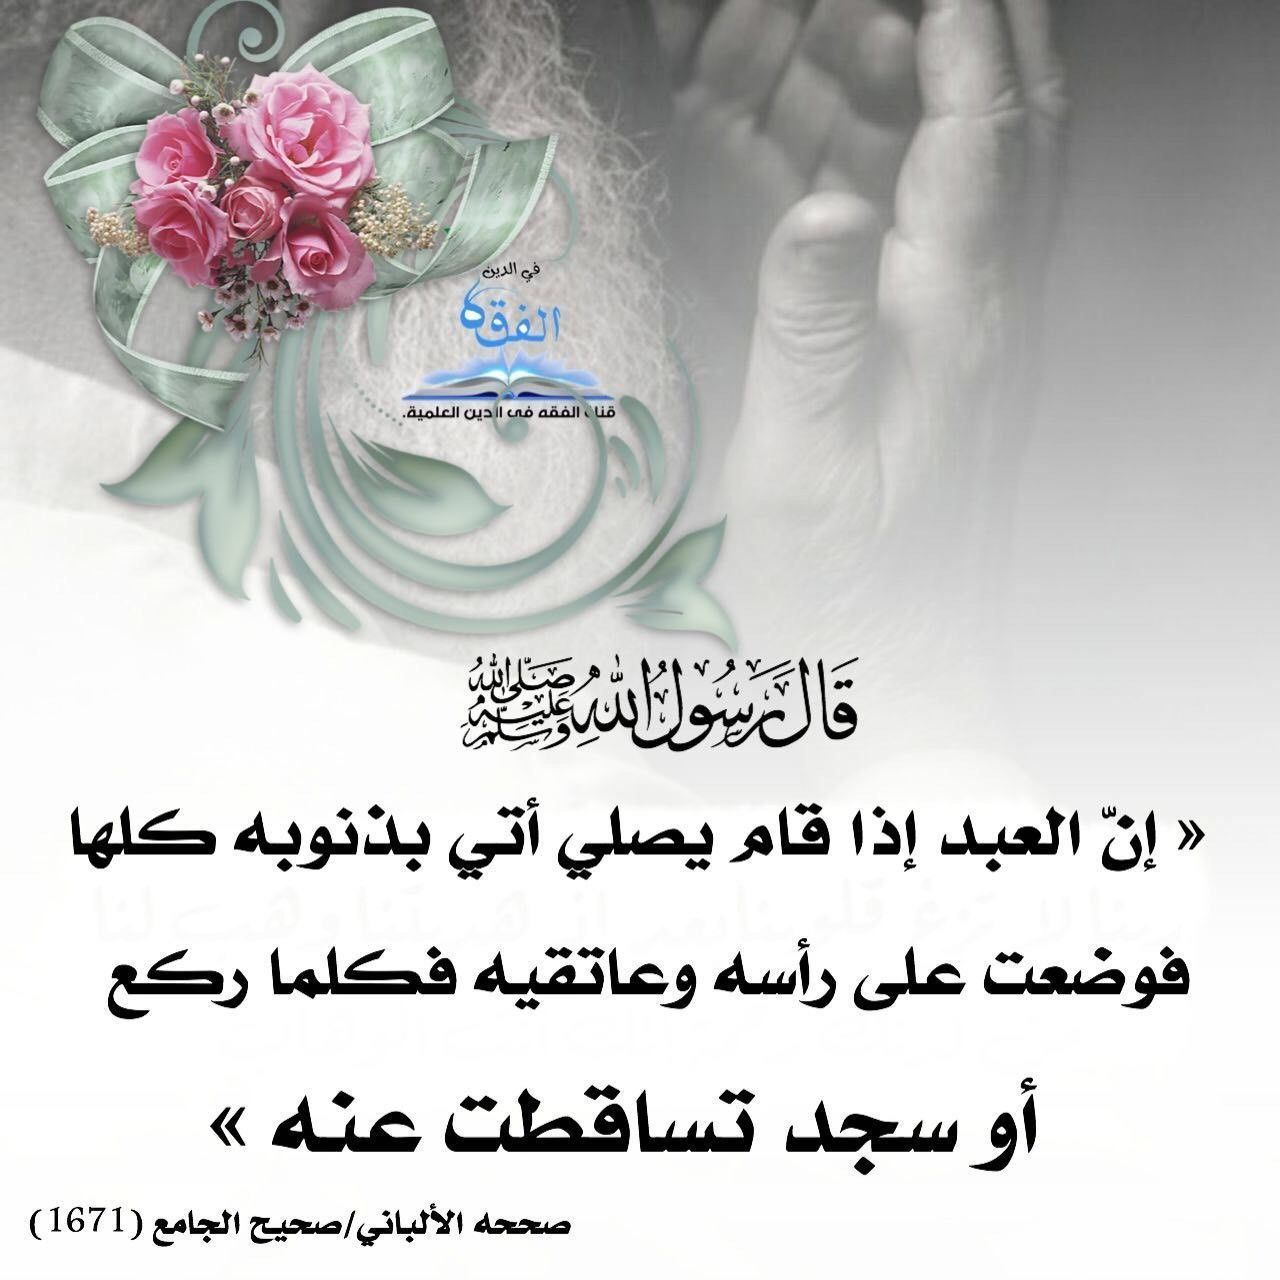 Pin By زهرة الياسمين On الصلاة Hadith Personal Care Islam